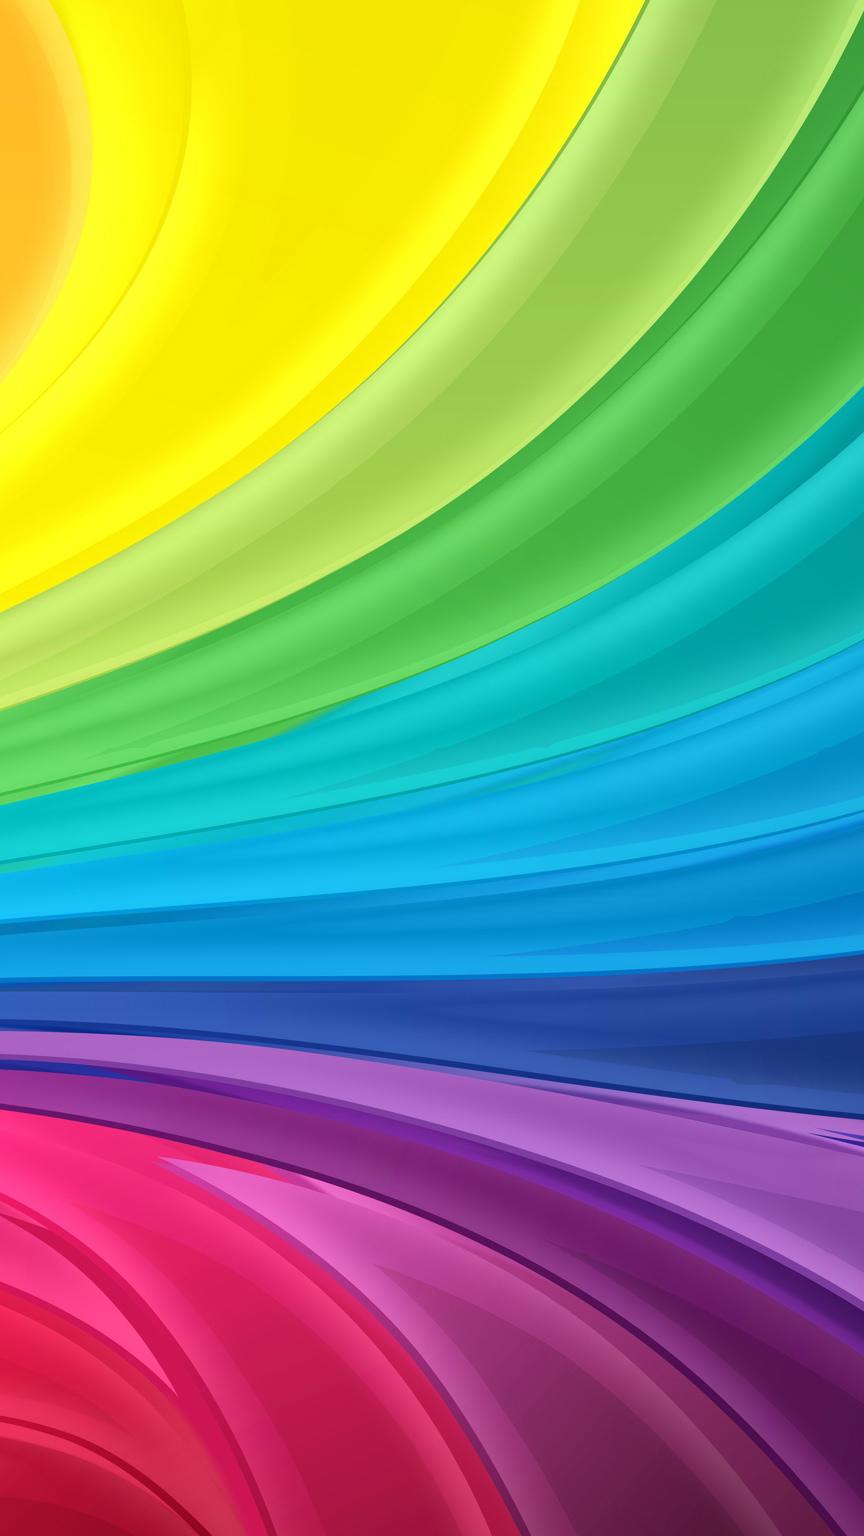 background abstract wallpaper bright illustration design art graphic stripe color